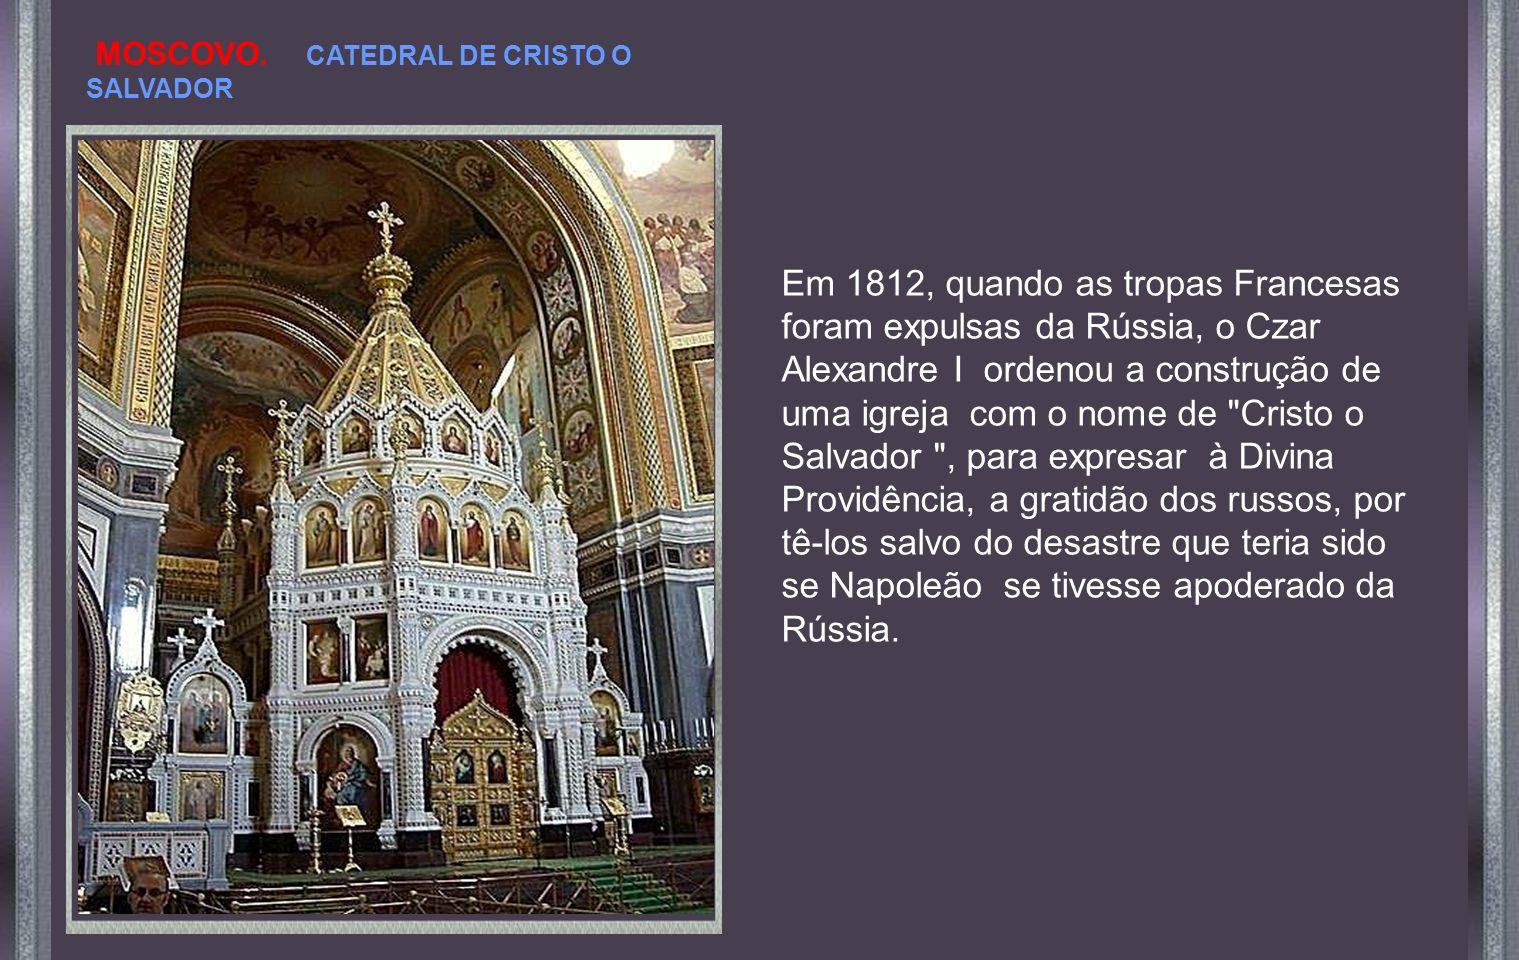 MOSCOVO. CATEDRAL DE CRISTO O SALVADOR